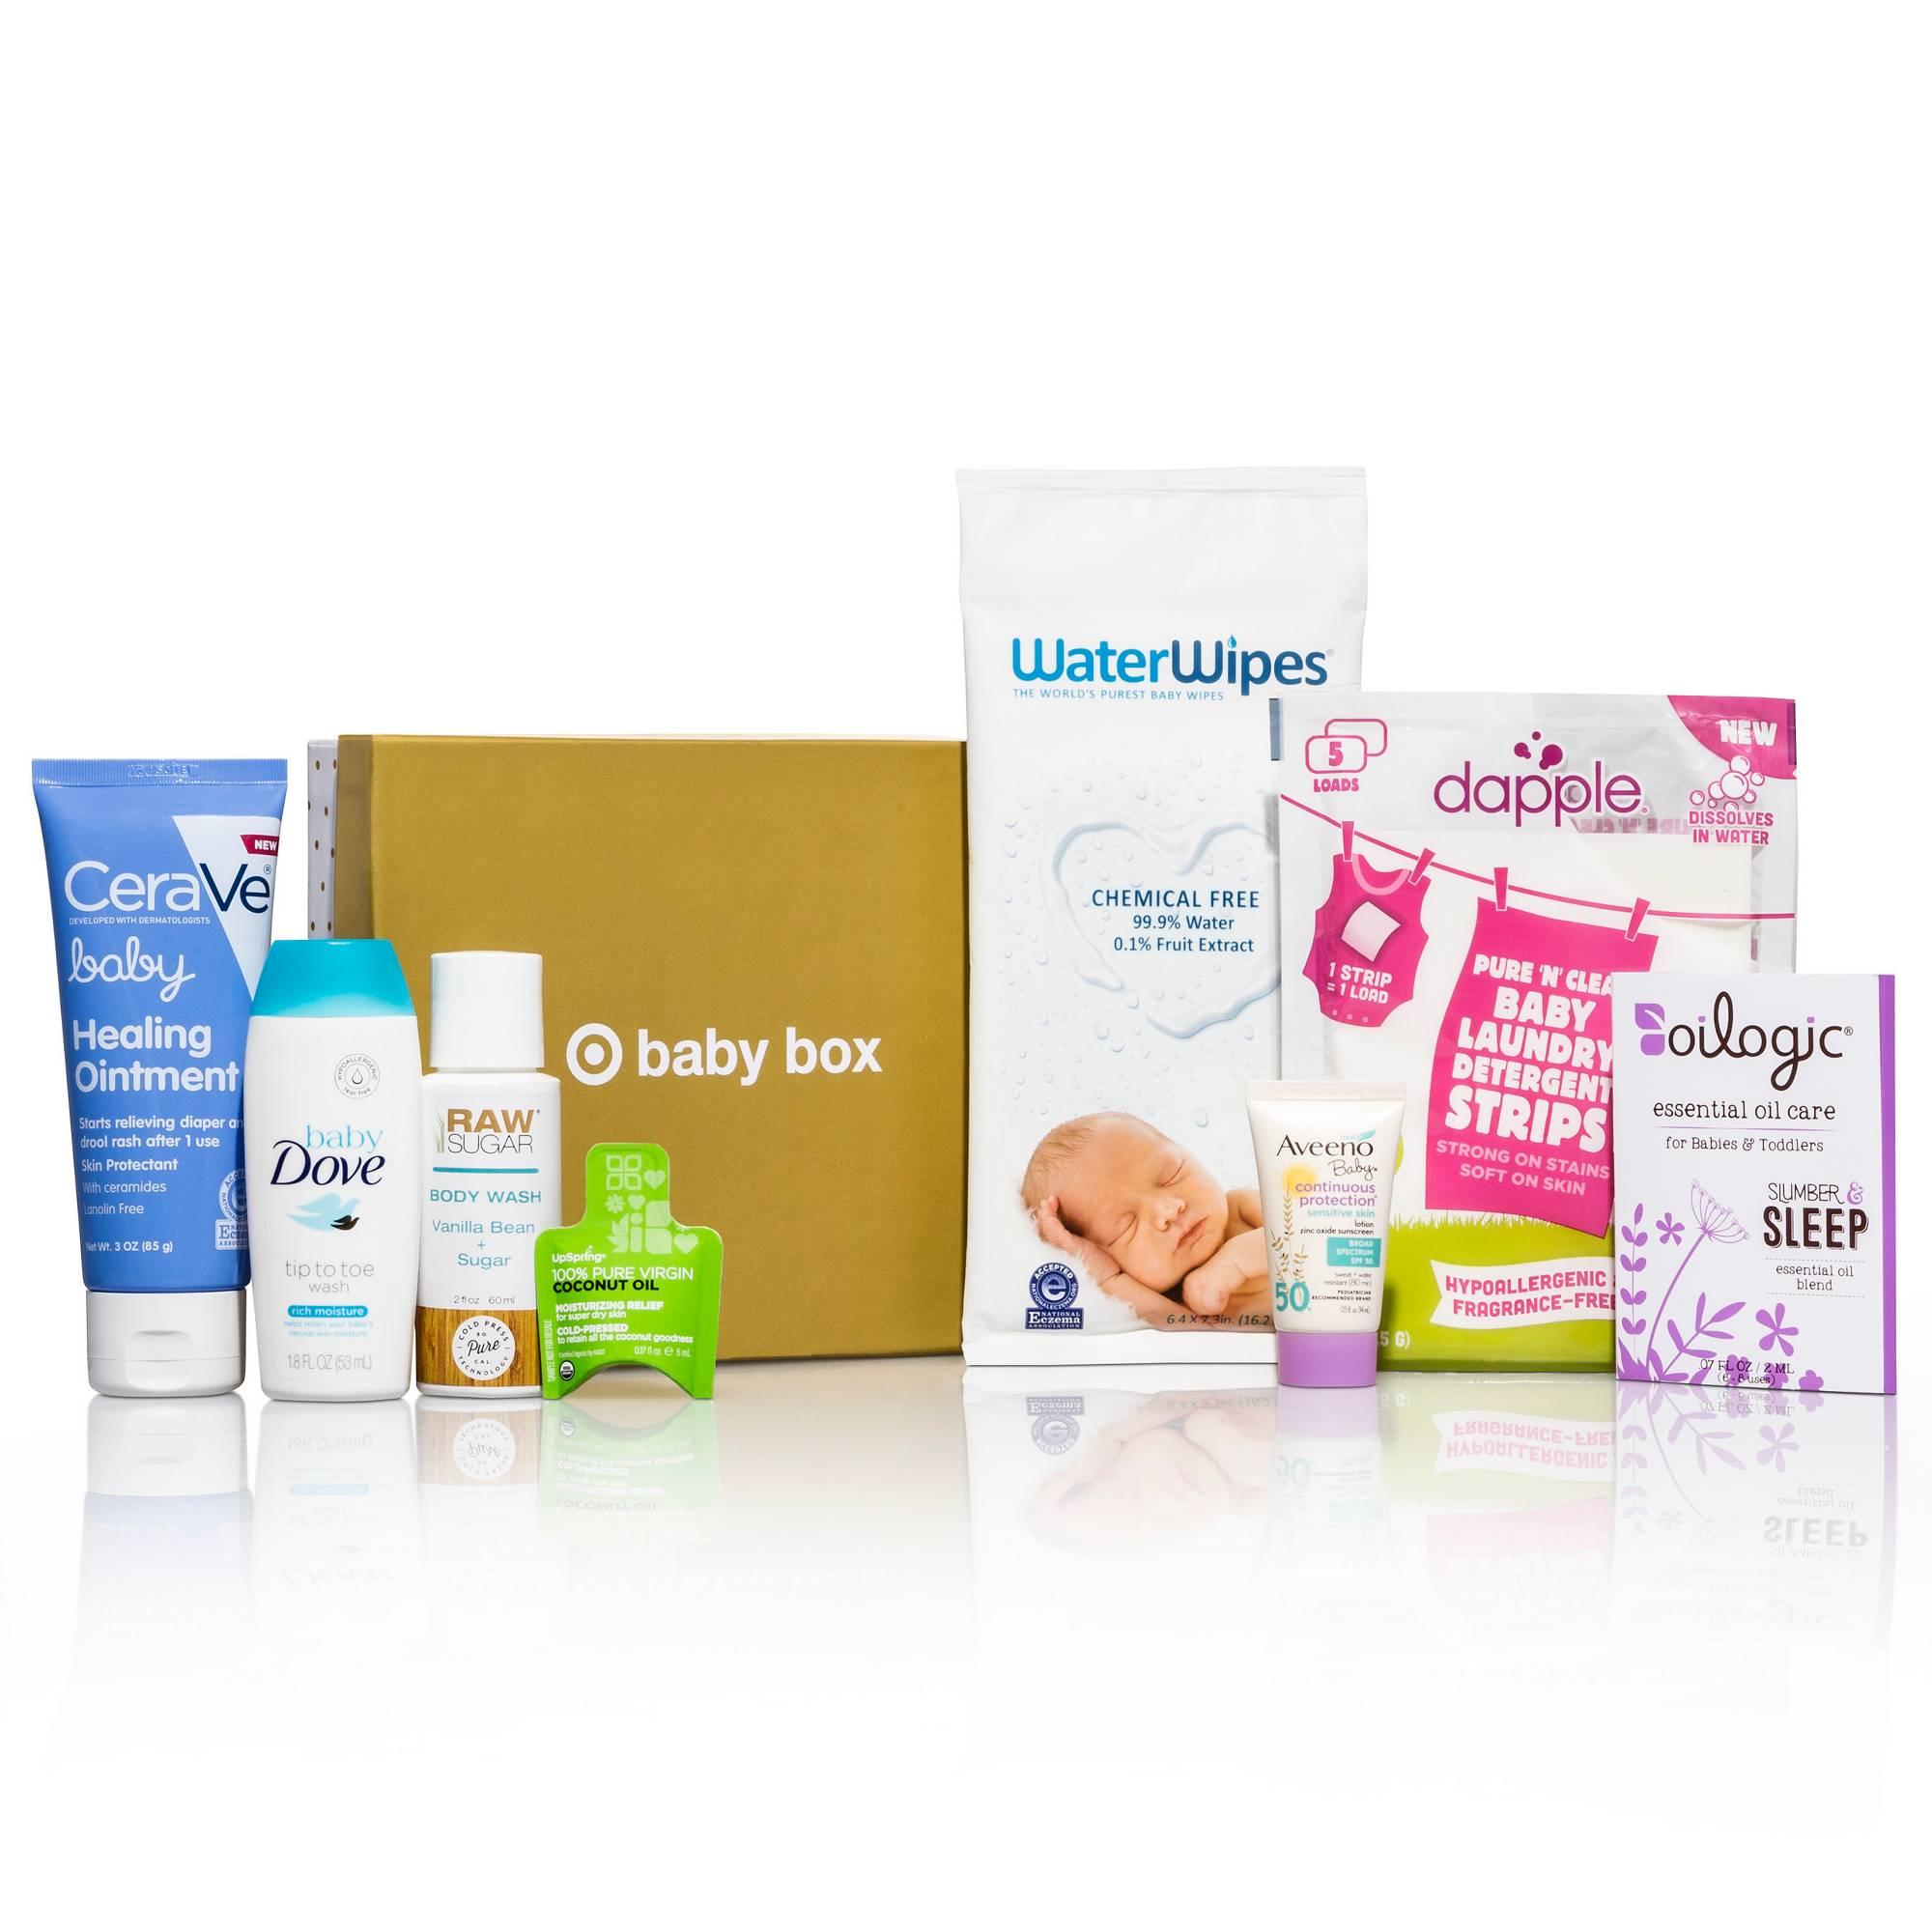 Target April Baby Box $5 + Free Shipping